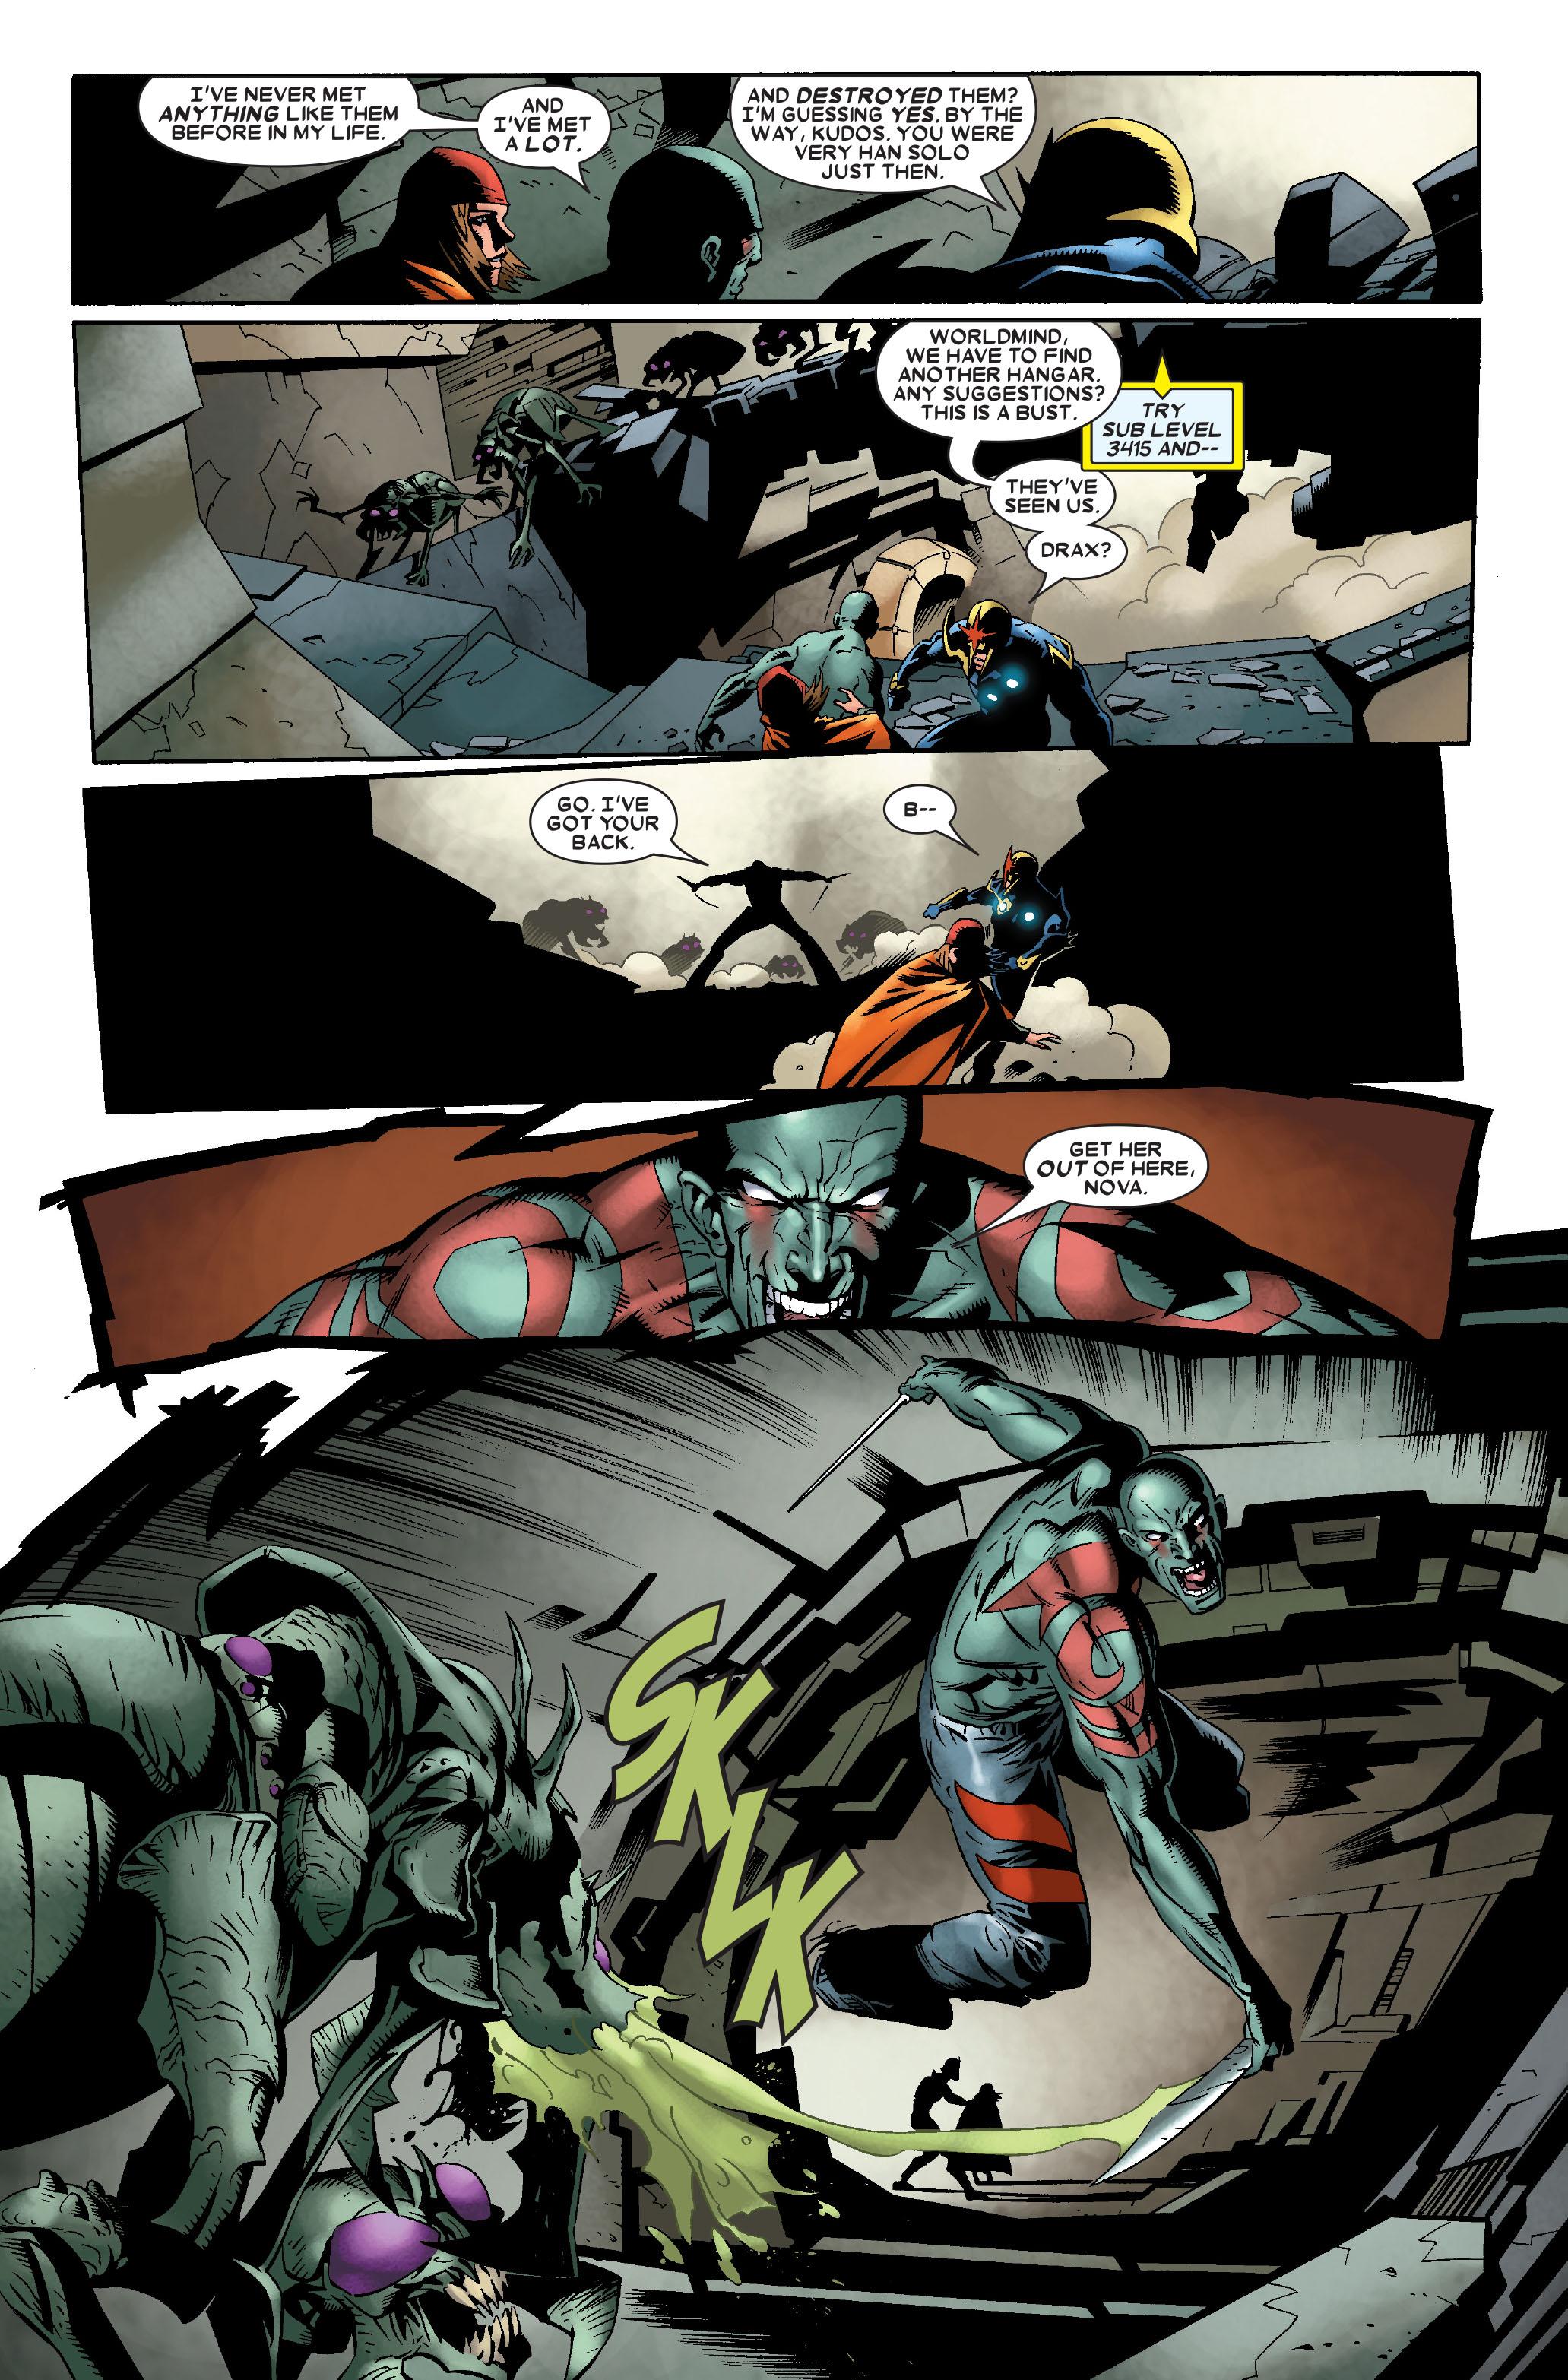 Read online Annihilation: Nova comic -  Issue #2 - 10